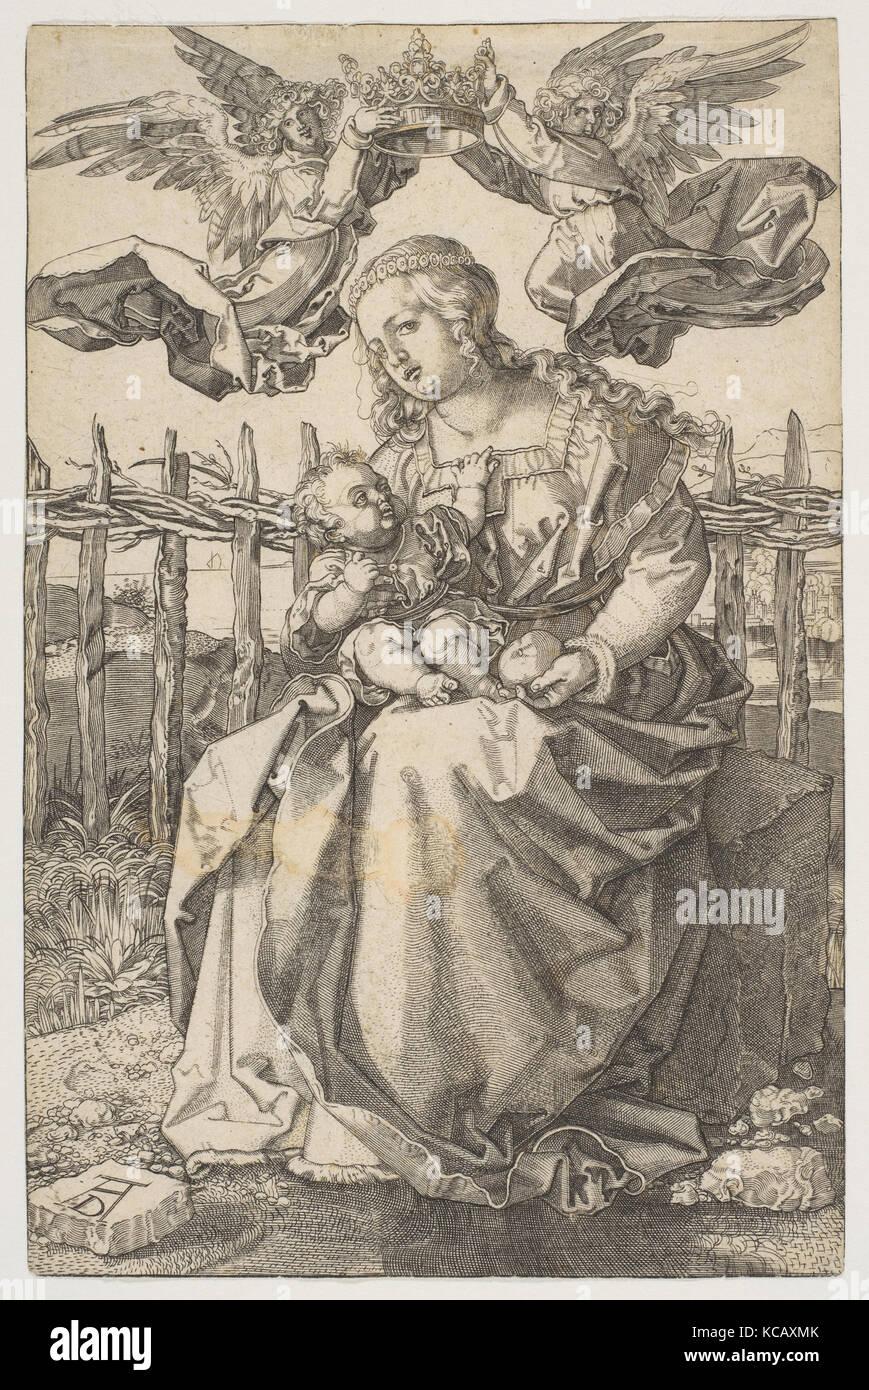 the virgin crowned by angels' made Αρχείο:stefan lochner the virgin crowned by angels, c 1450jpg από τη βικιπαίδεια, την ελεύθερη εγκυκλοπαίδεια πήδηση στην πλοήγηση πήδηση στην αναζήτηση.